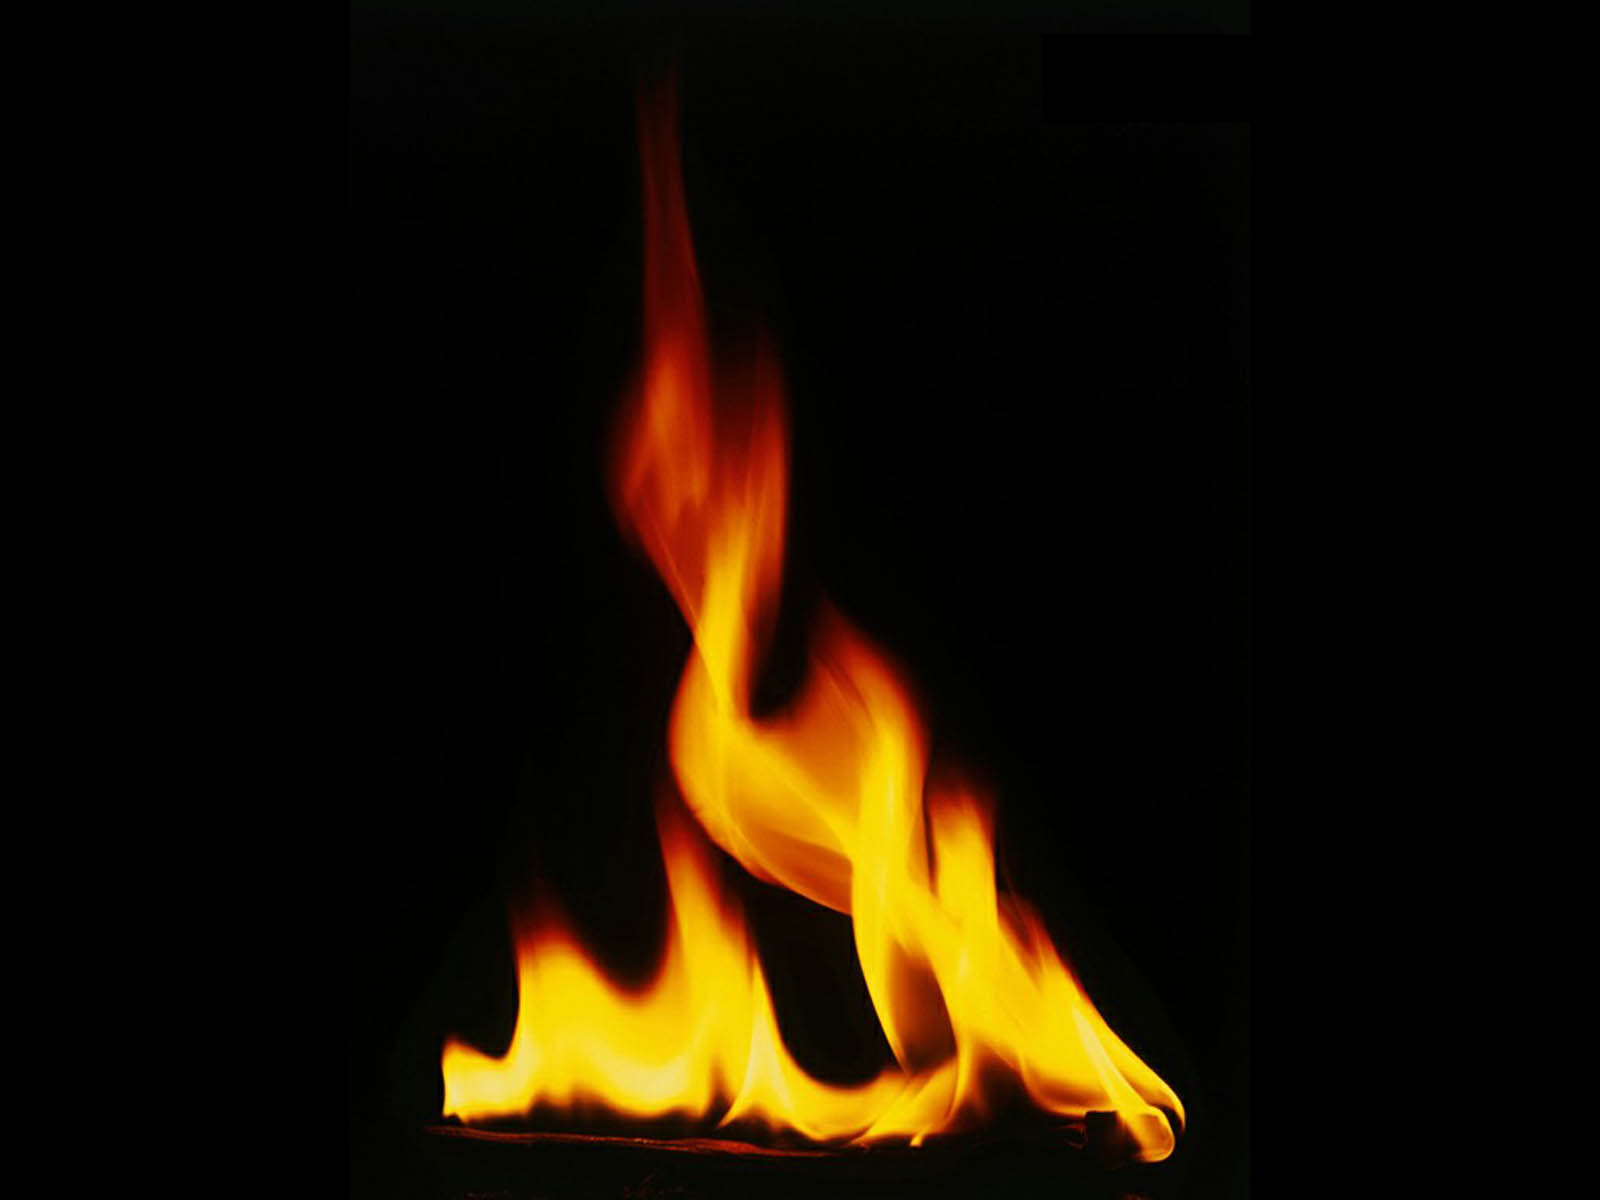 http://4.bp.blogspot.com/-b6gLSeRiPkU/UFCpWWDSGAI/AAAAAAAAJvw/gJQinXeB7MQ/s1600/Fire+Wallpapers+3.jpg